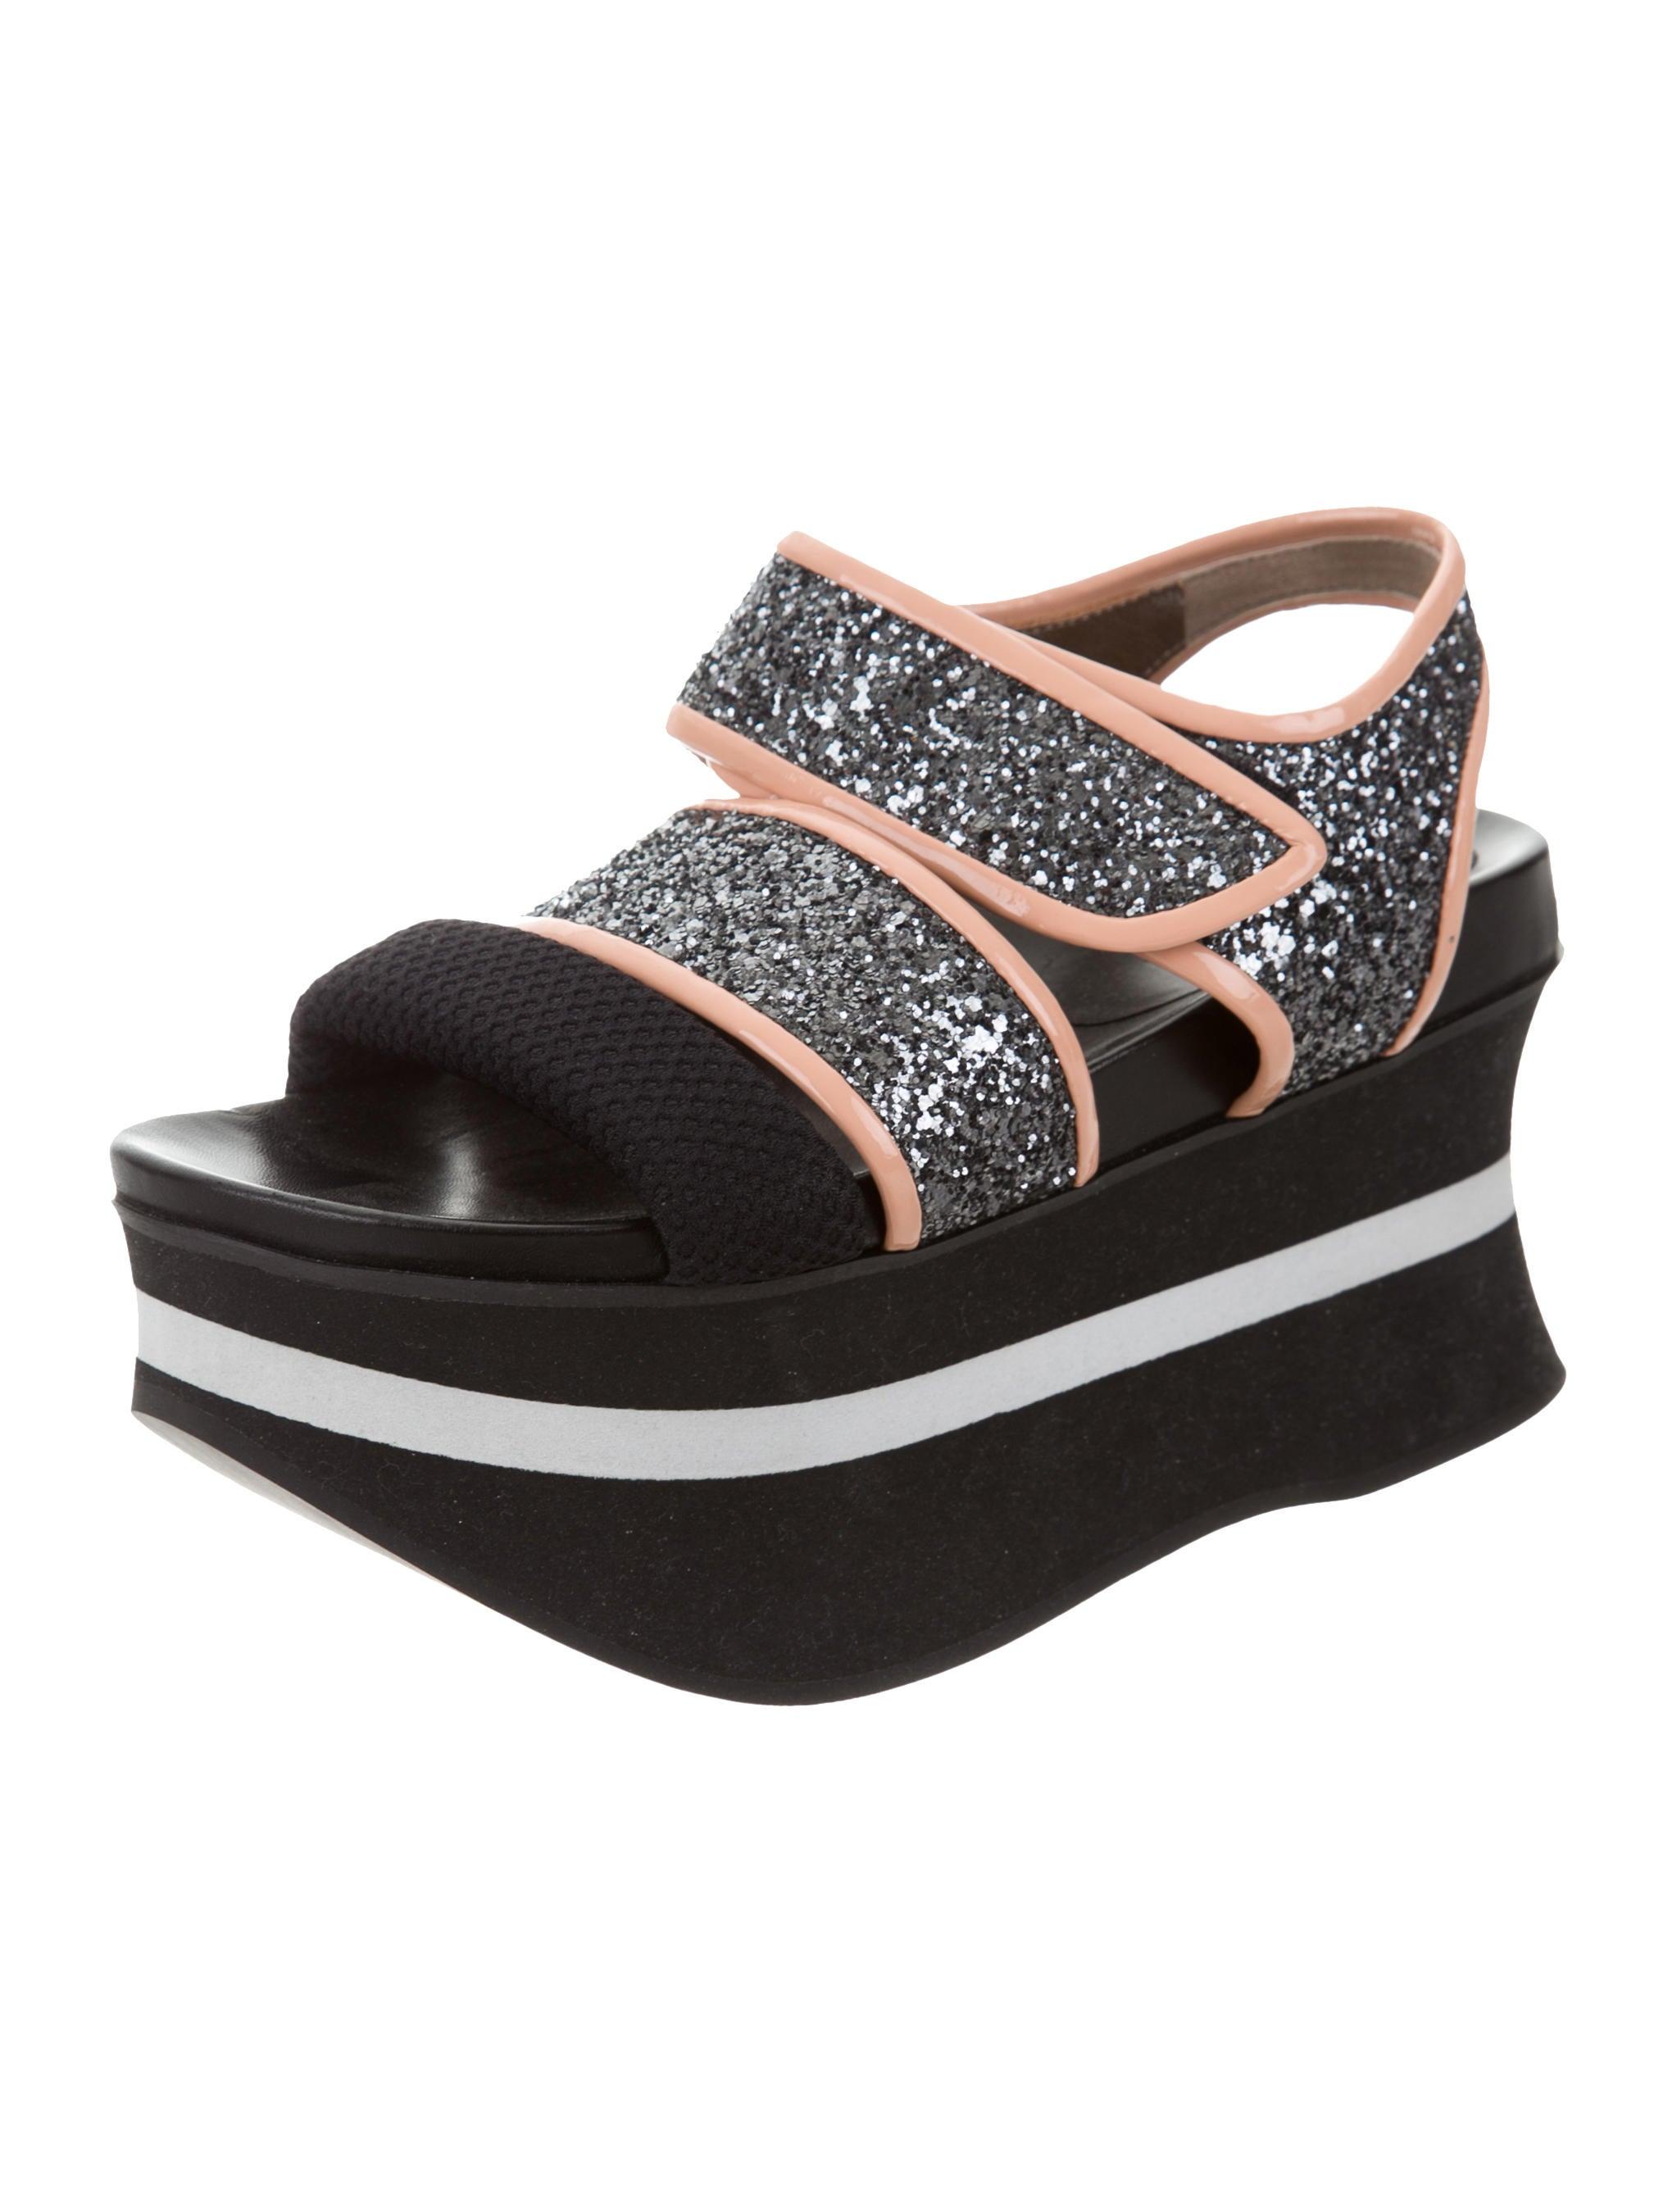 Black Glitter Shoes Size